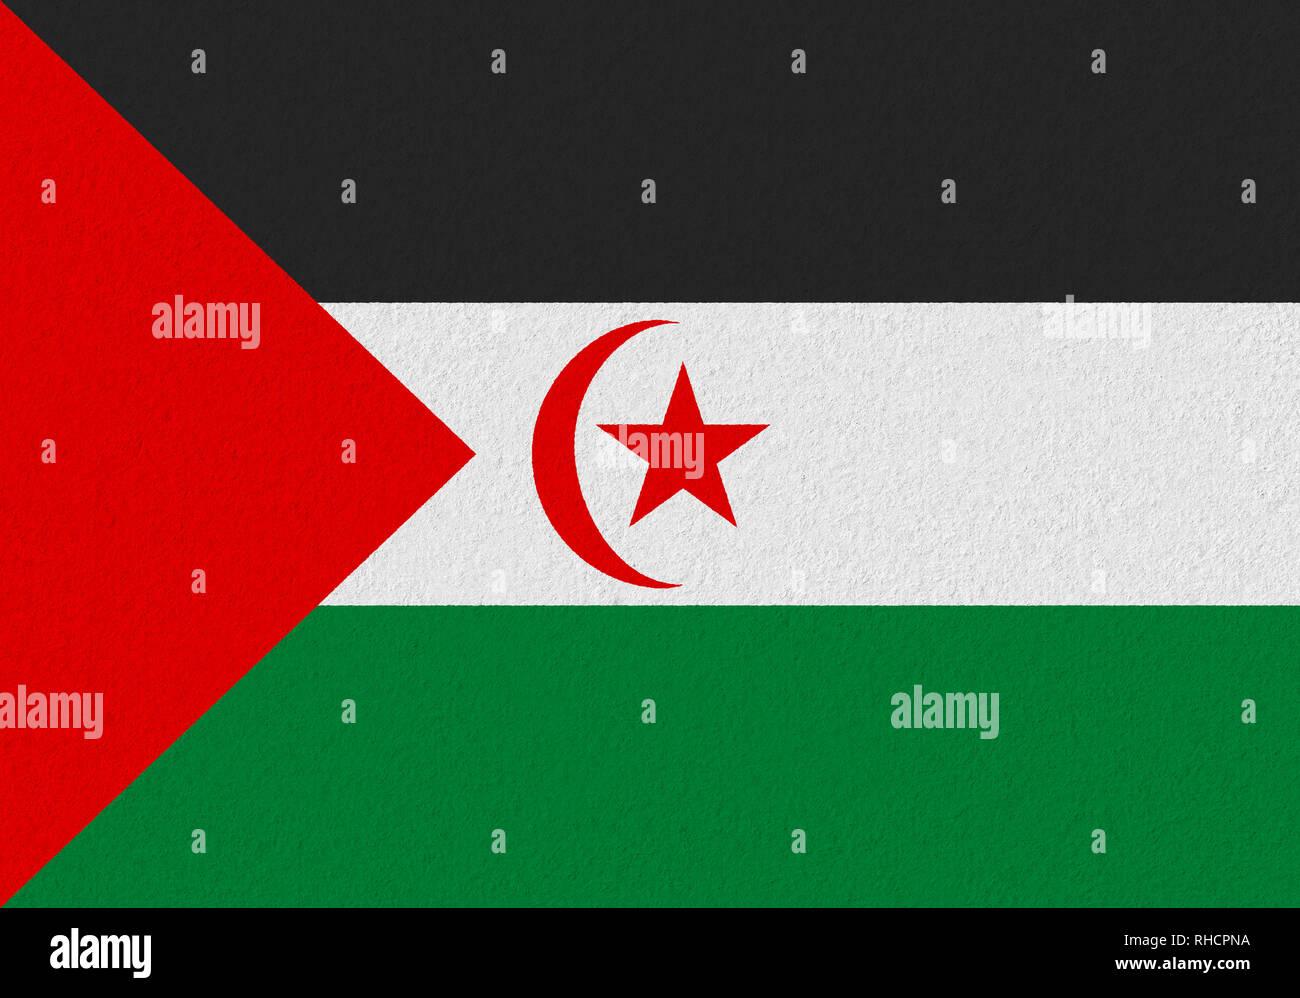 Sahrawi Arab Democratic Republic paper flag. Patriotic background. National flag of Sahrawi Arab Democratic Republic - Stock Image